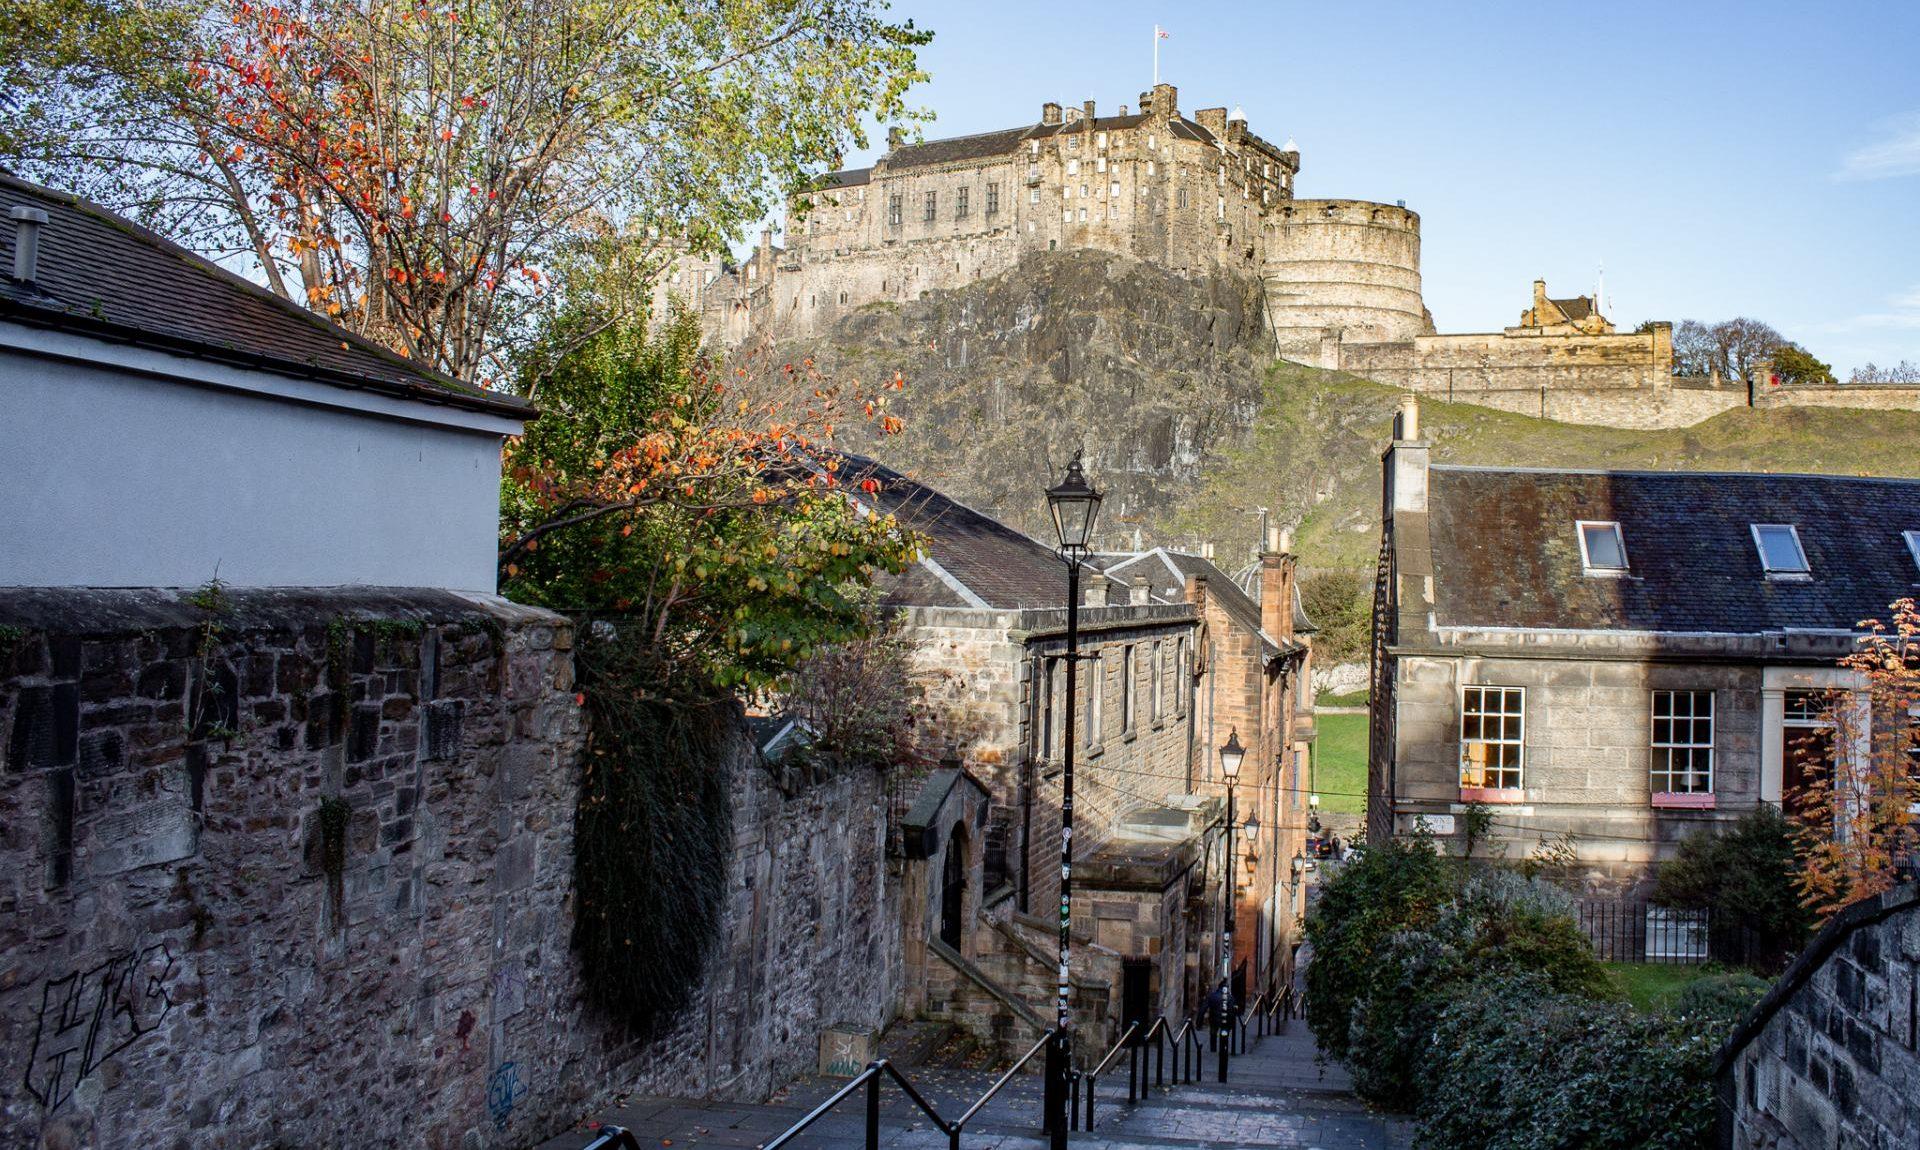 48 hours in Edinburgh - The Vennel